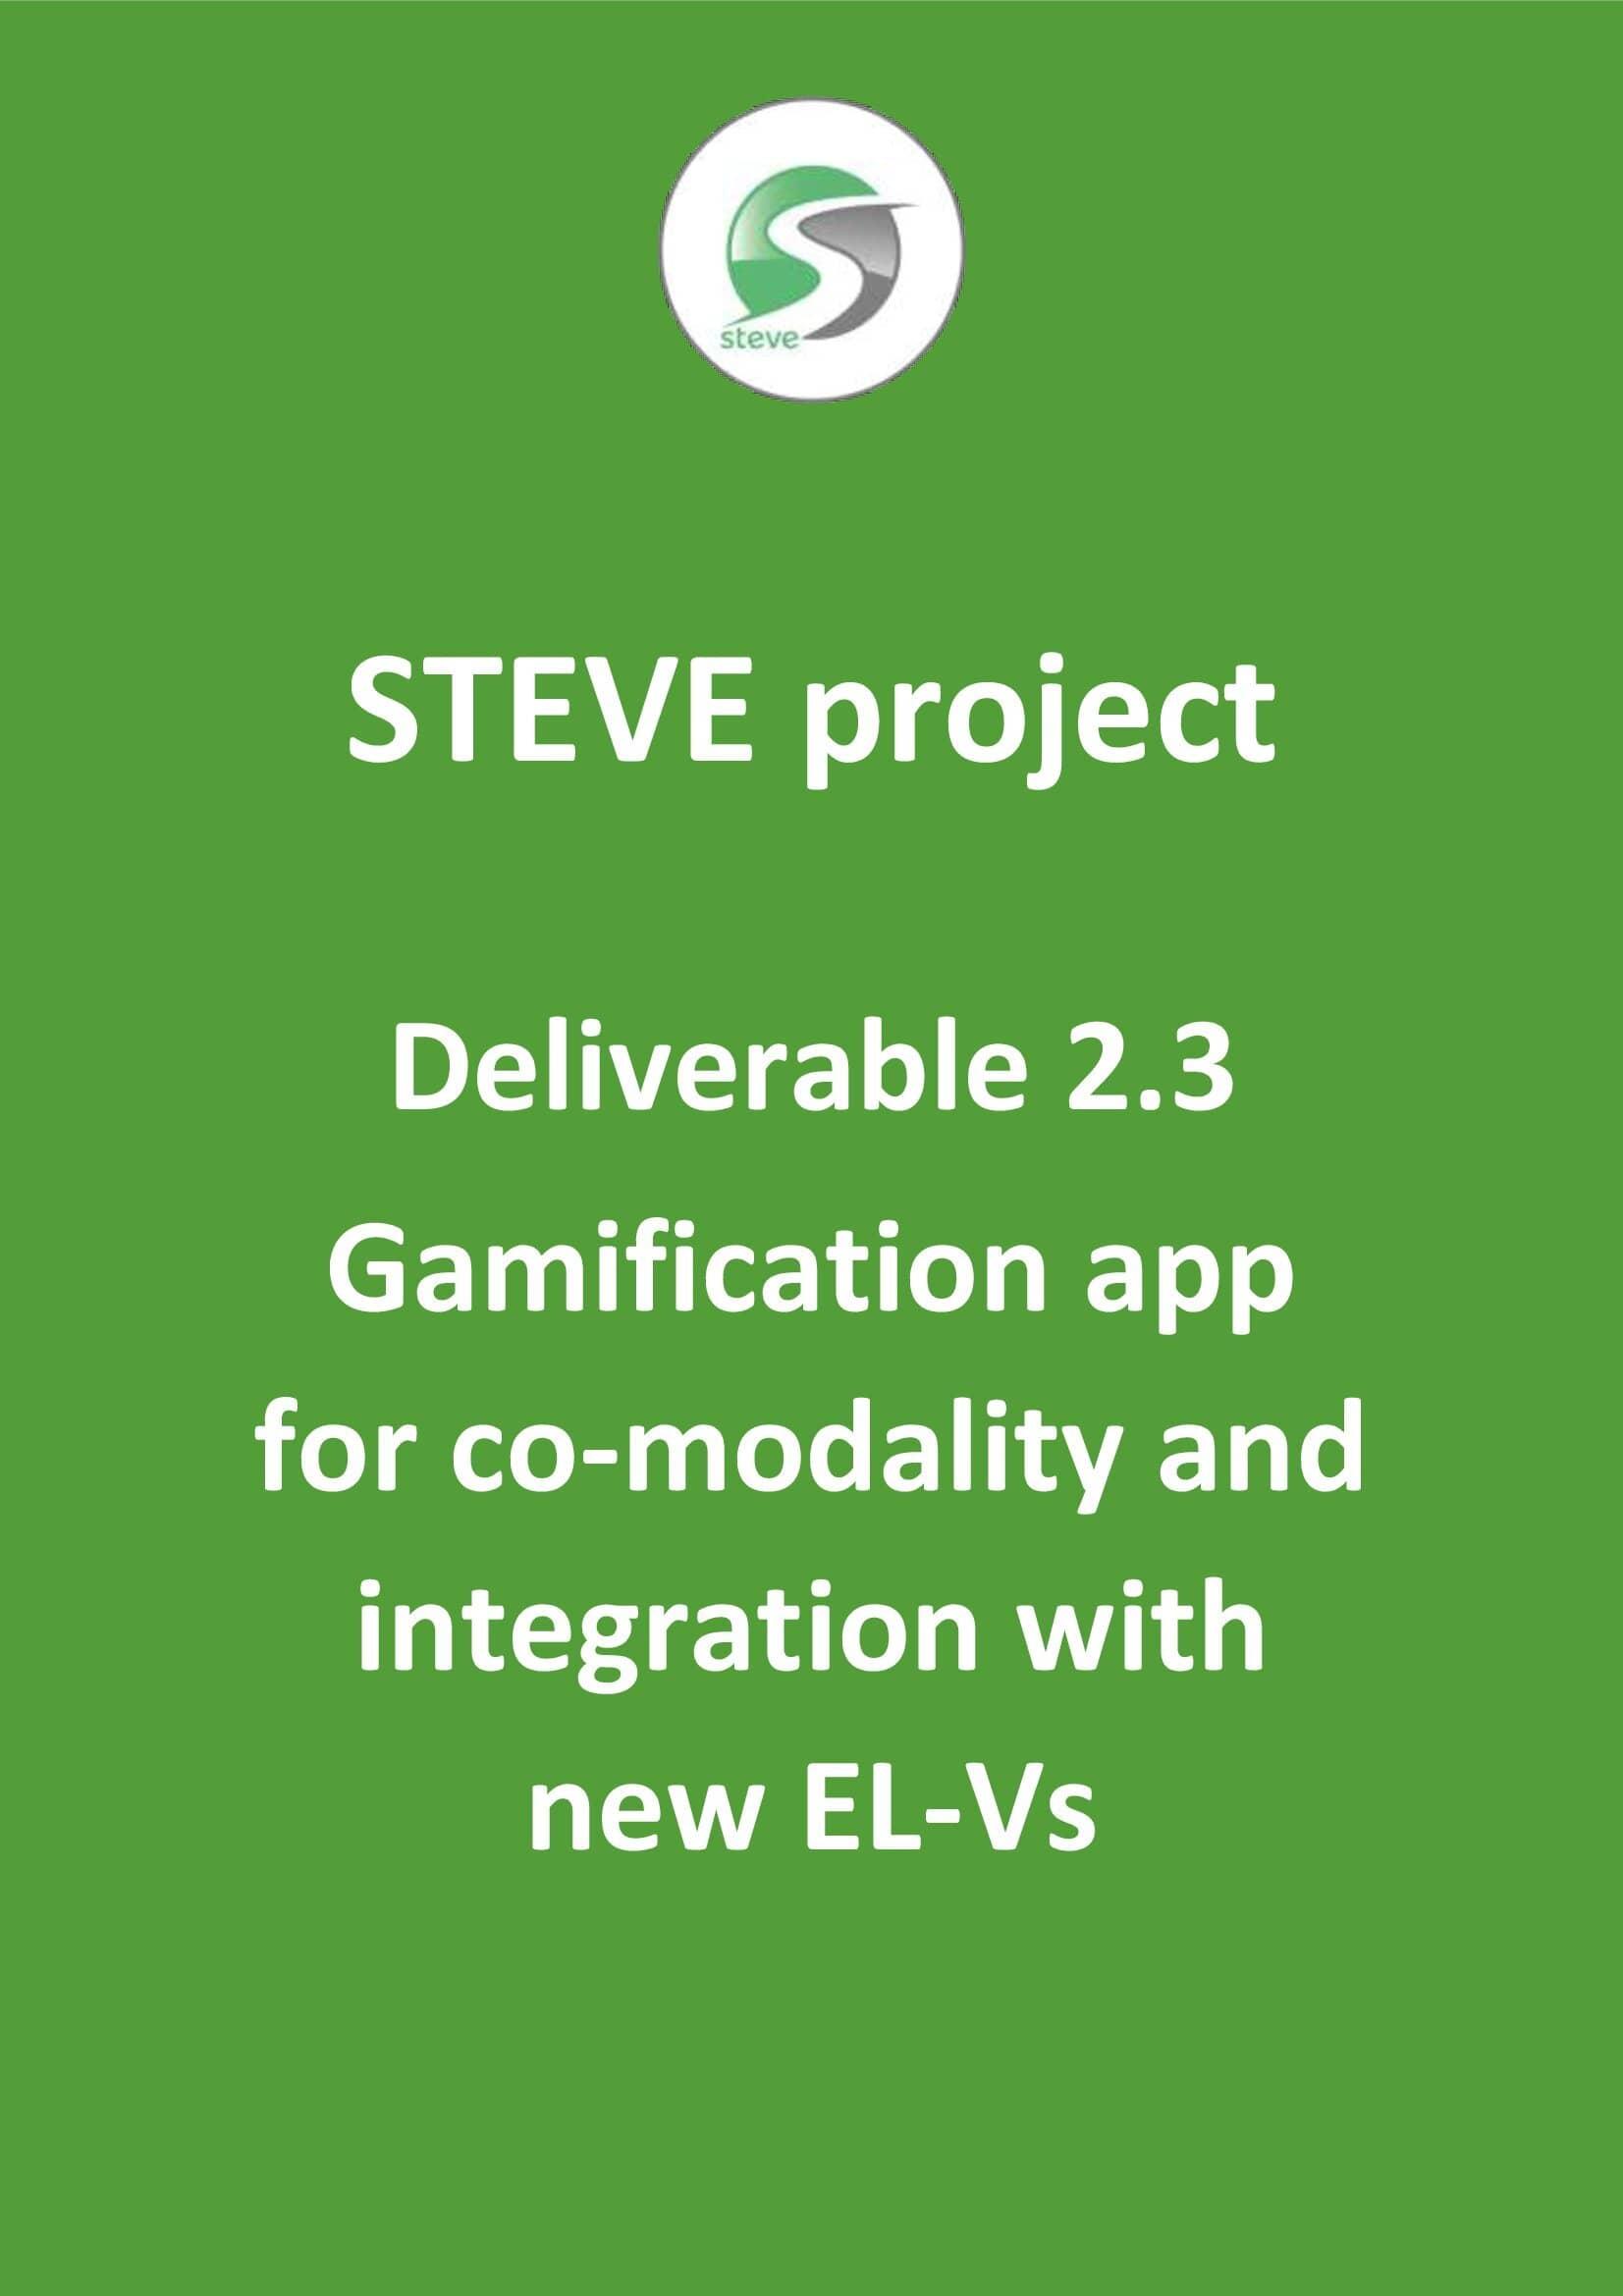 Deliverable 2.3